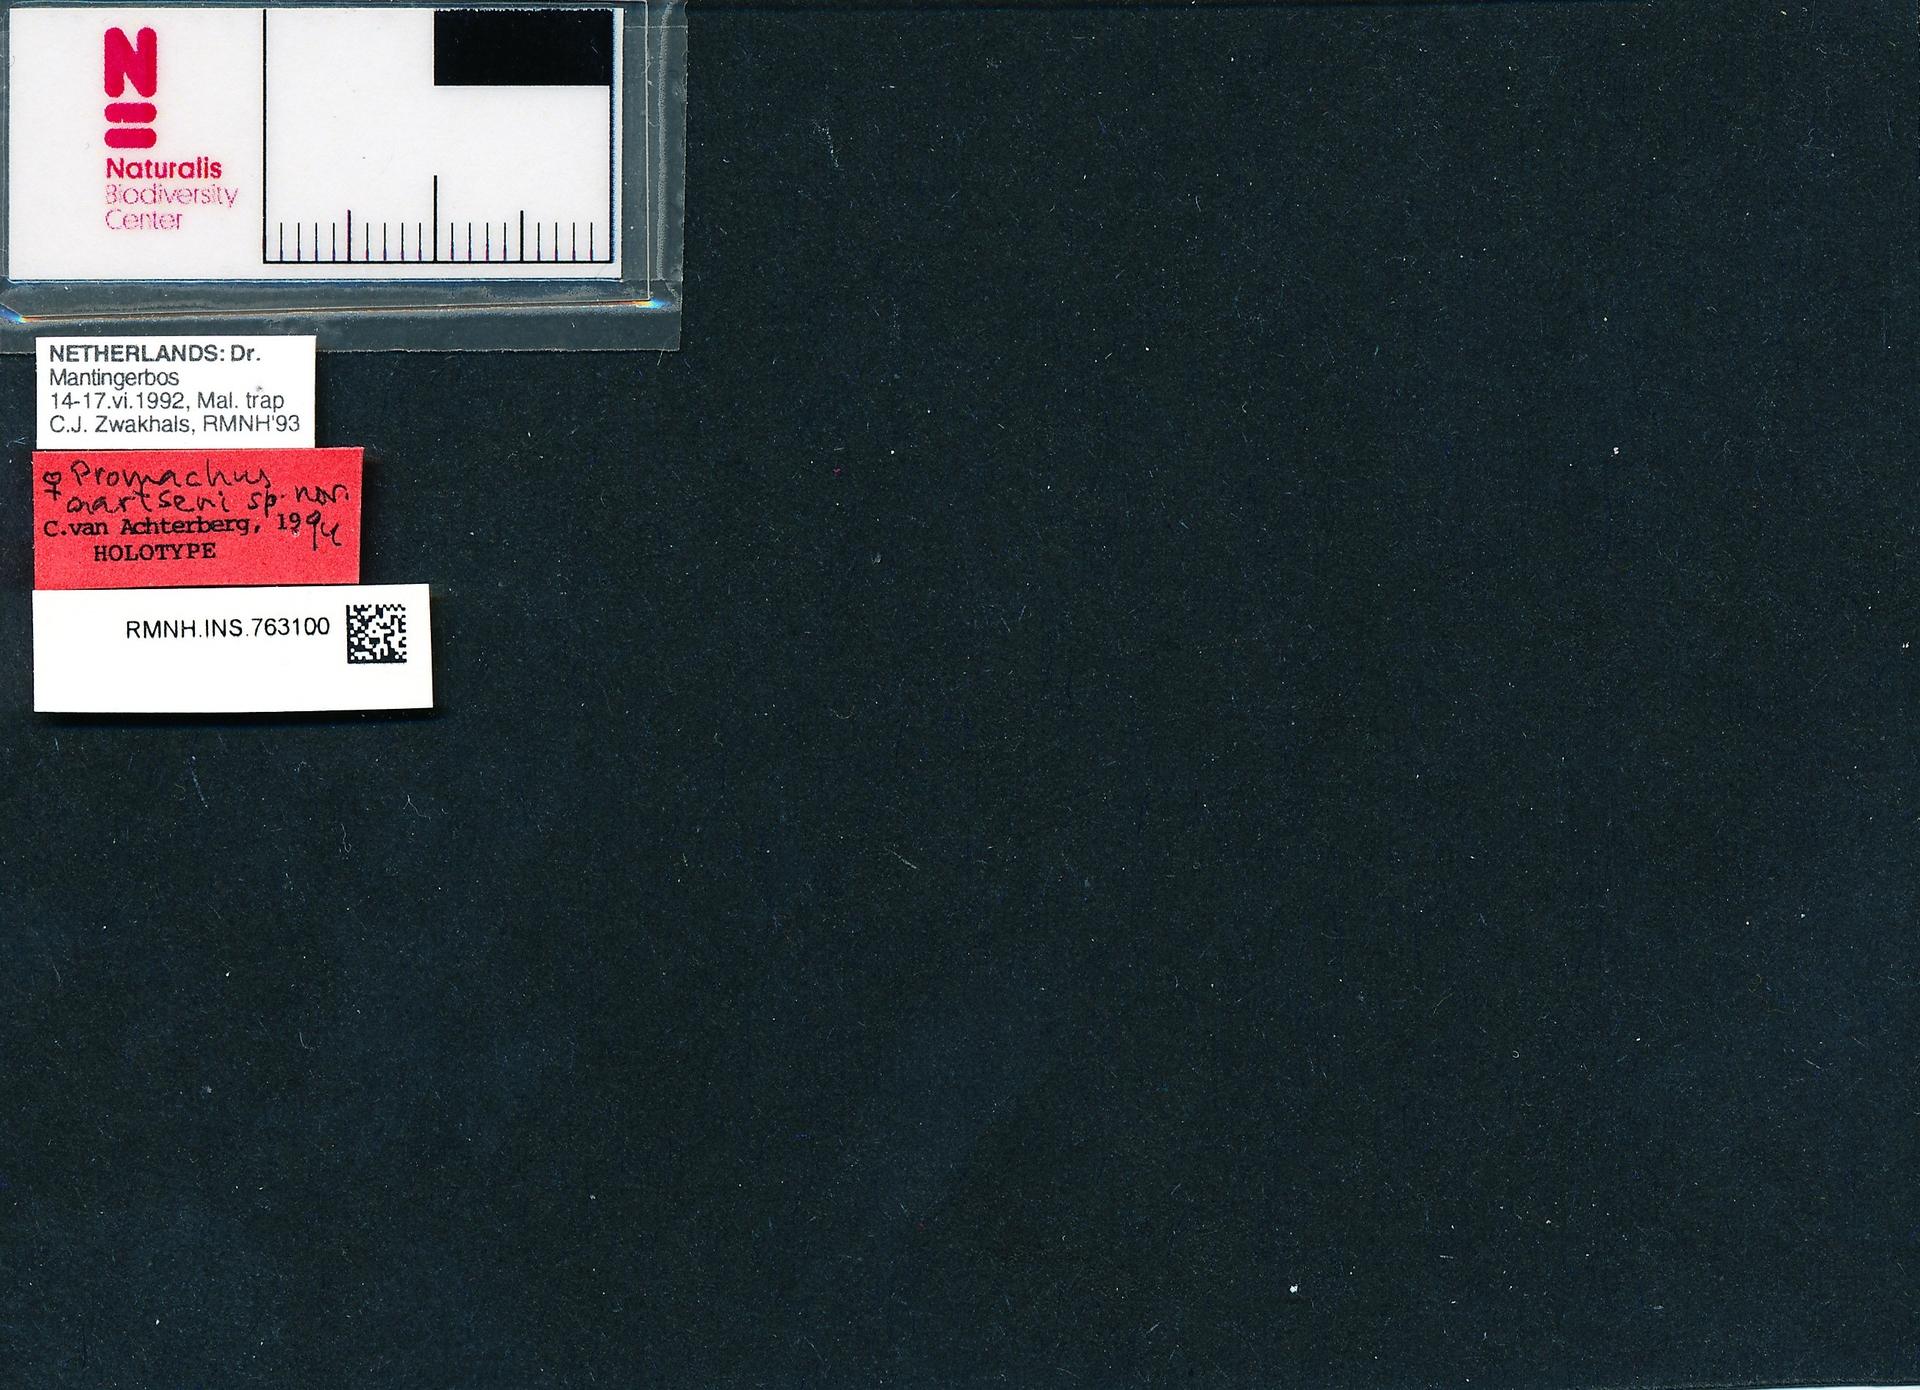 RMNH.INS.763100 | Promachus aartseni van Achterberg, 1994